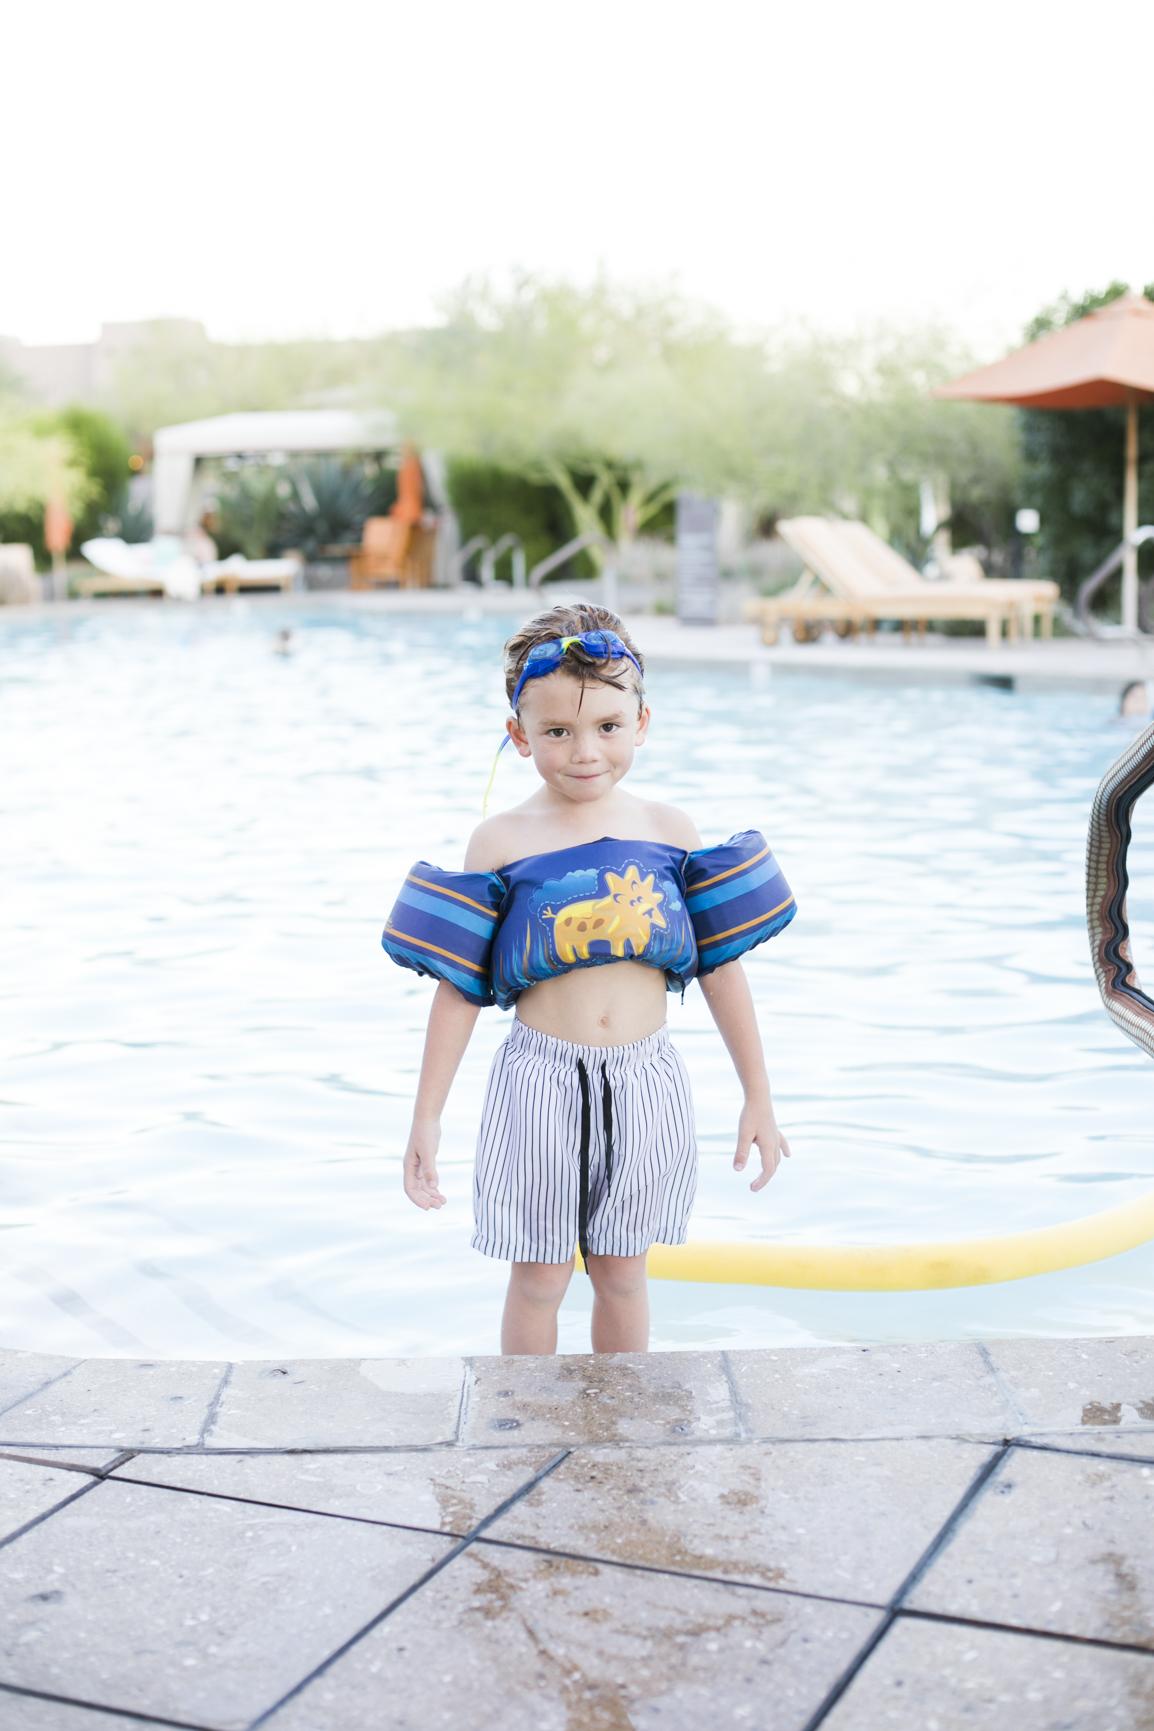 Resort Wear at the Four Season Resort Scottsdale